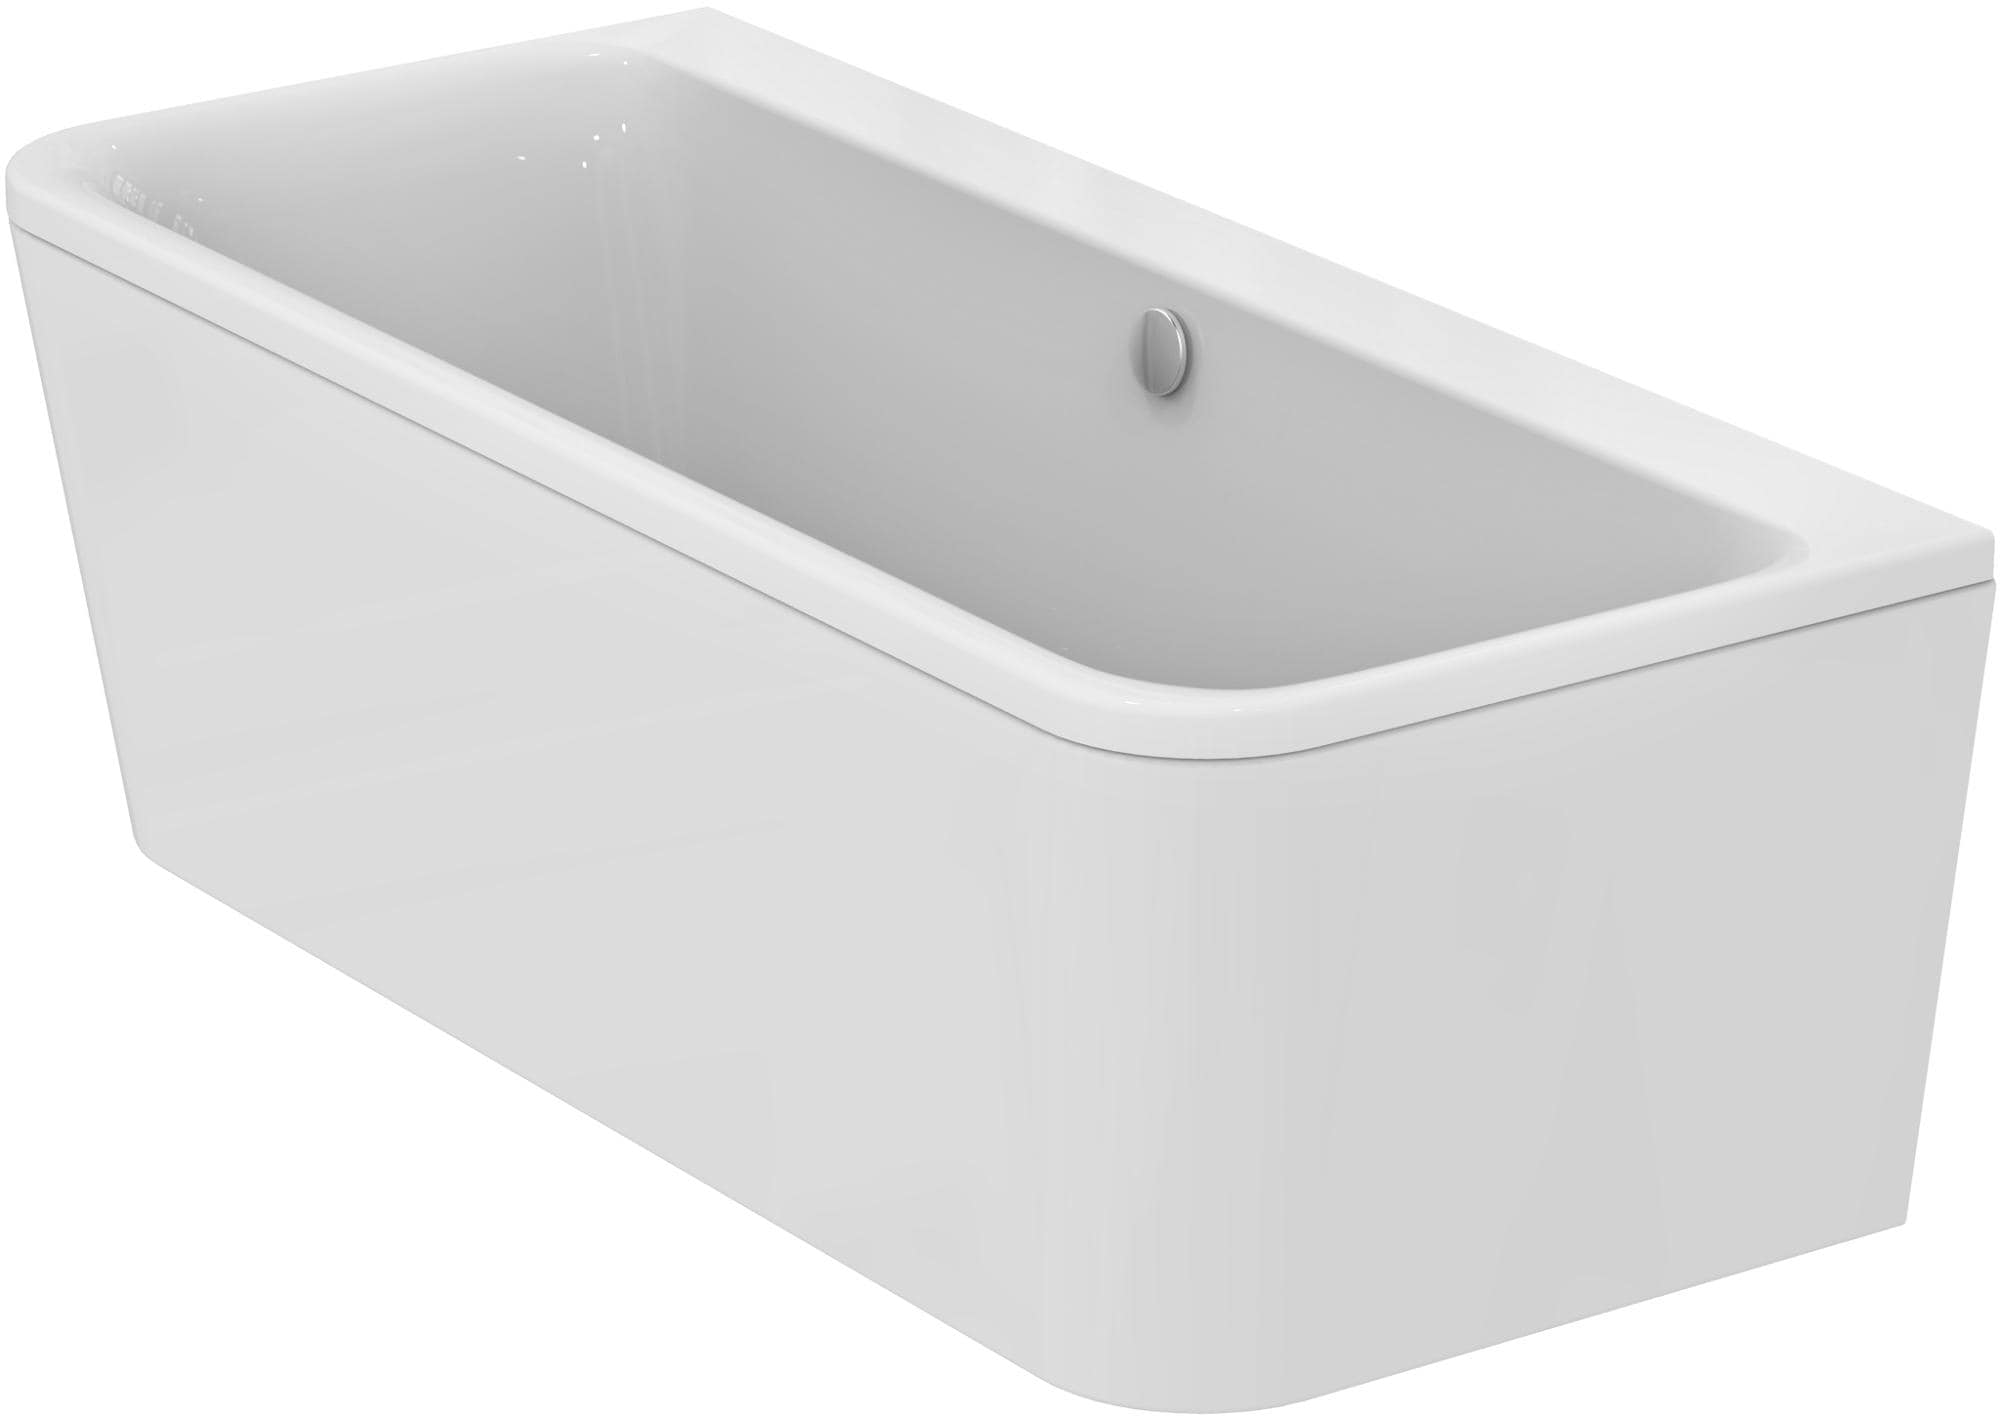 Ideal Standard Tonic II D-Form-Badewanne, BxTxH 1800 x 800 x 610mm ...